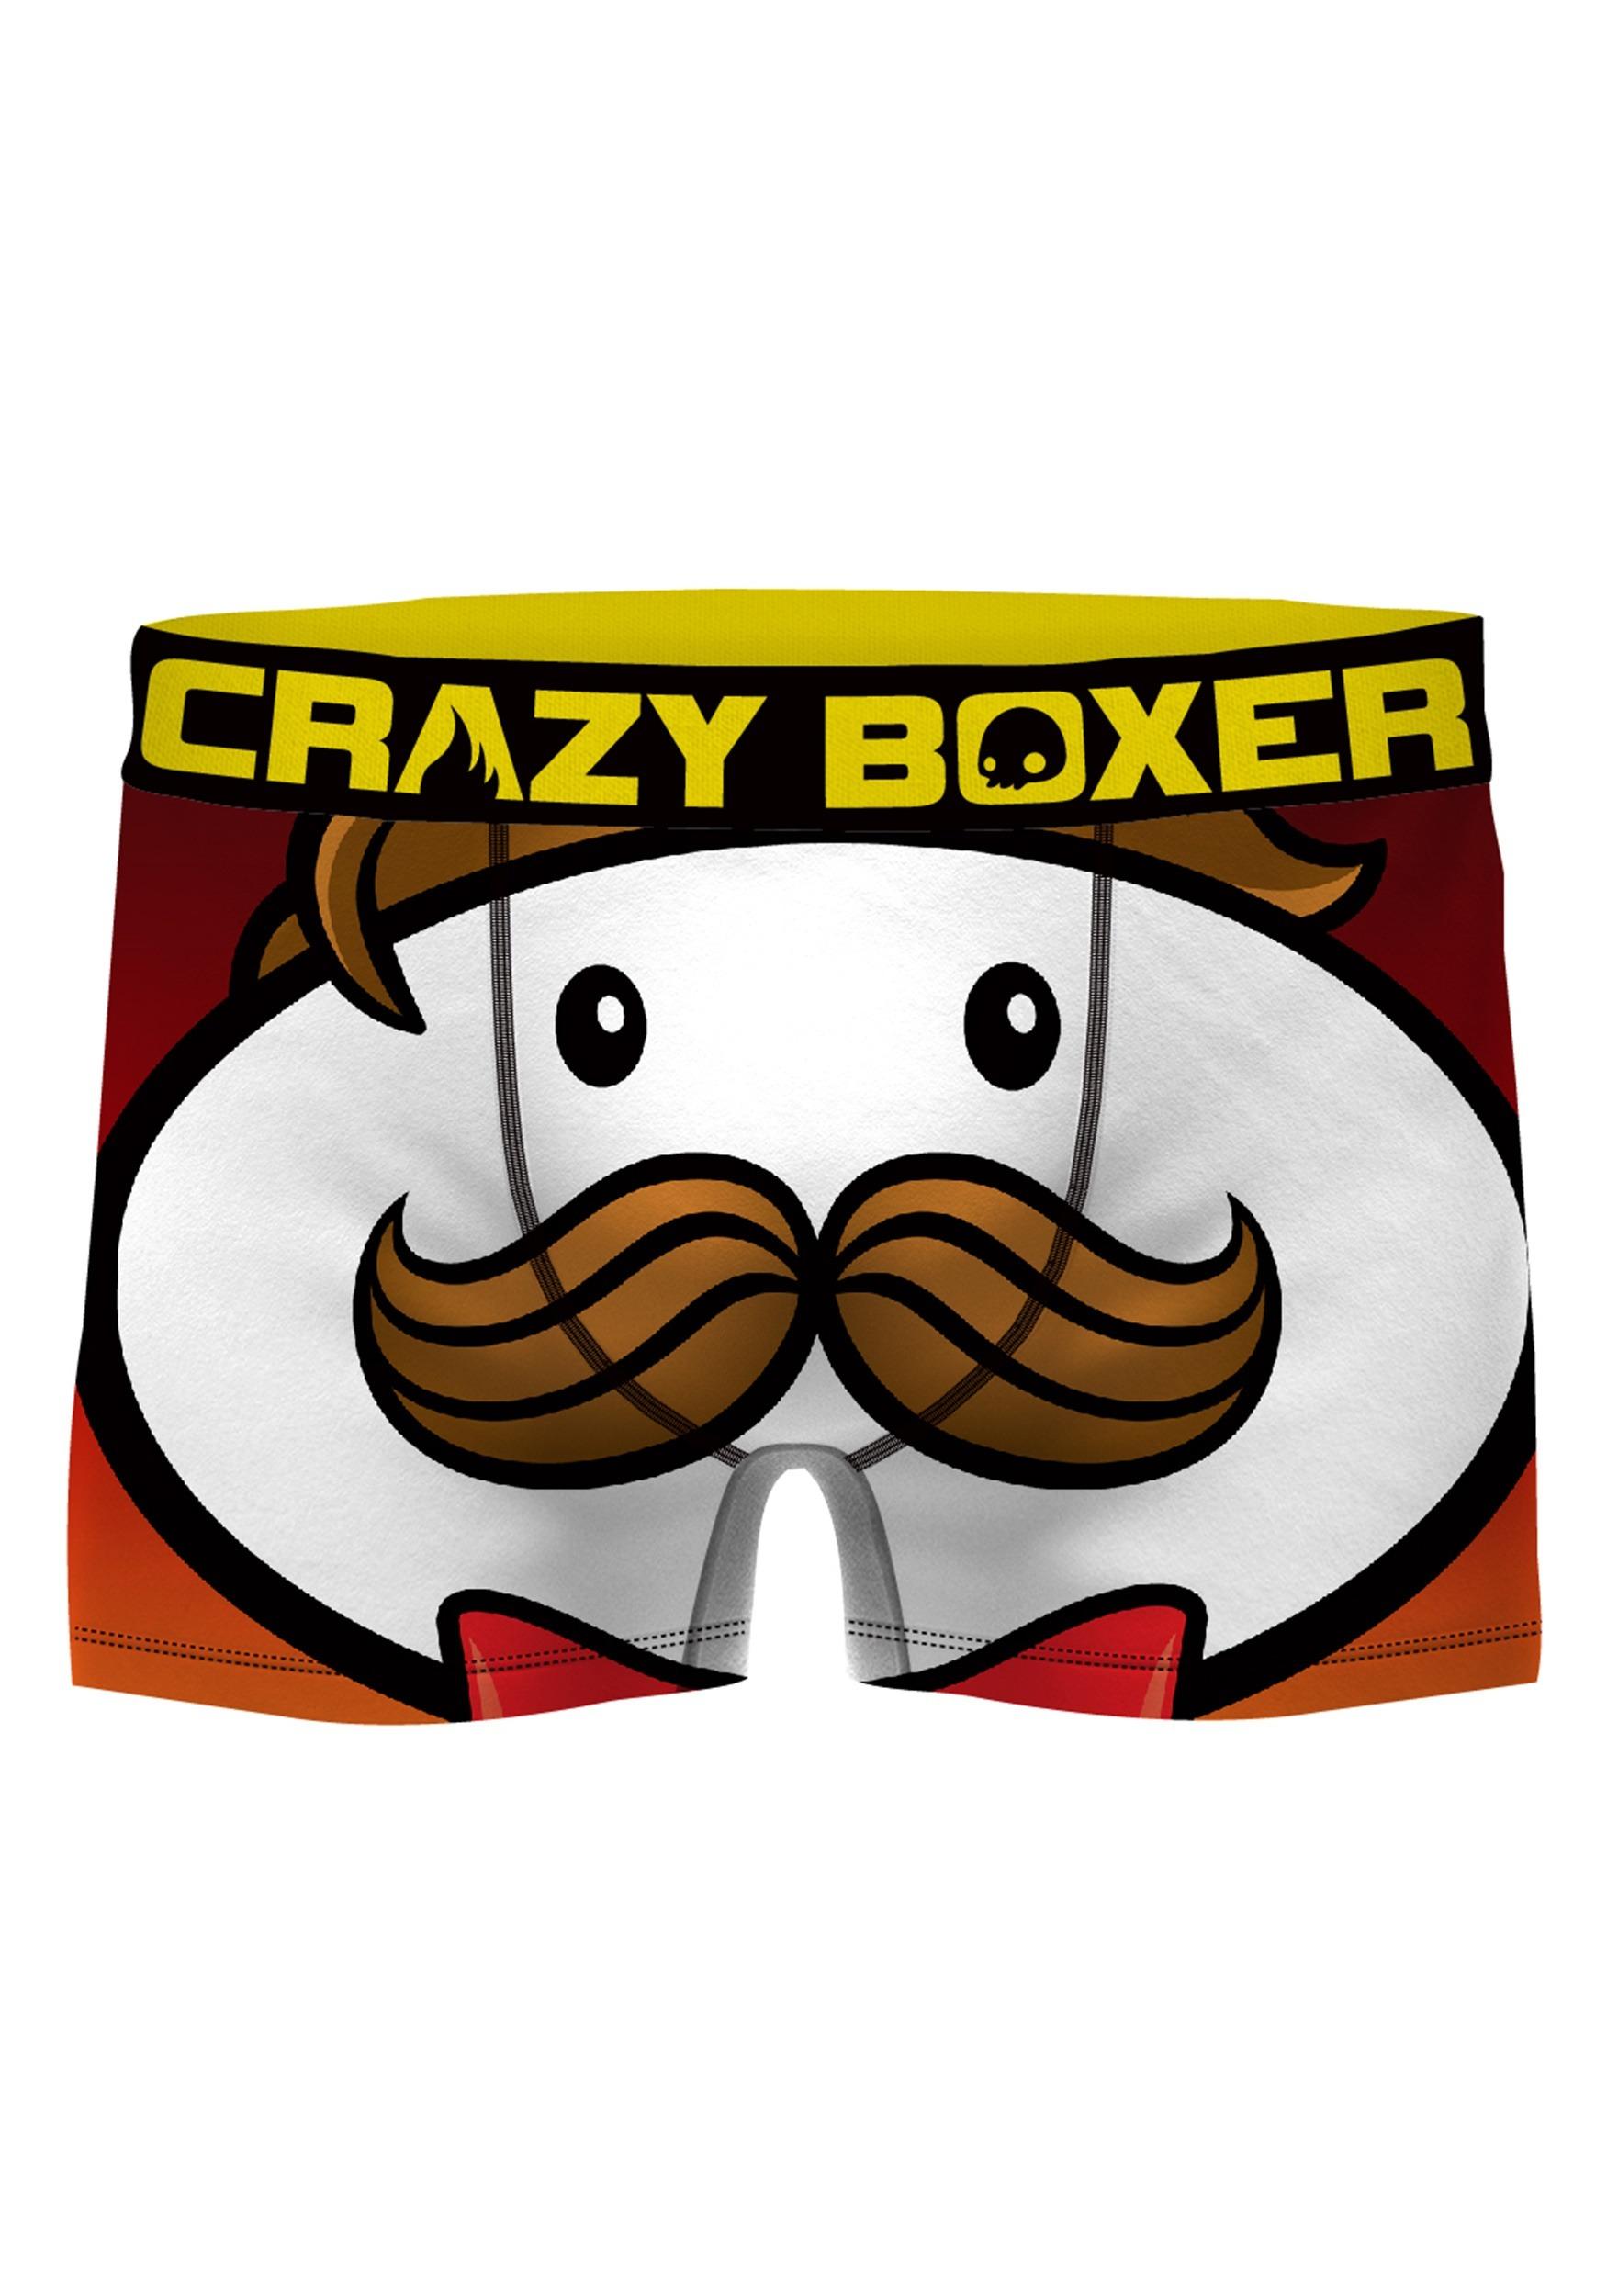 cf4a89ccf91e Crazy Boxers Men's Pringles Boxer Briefs